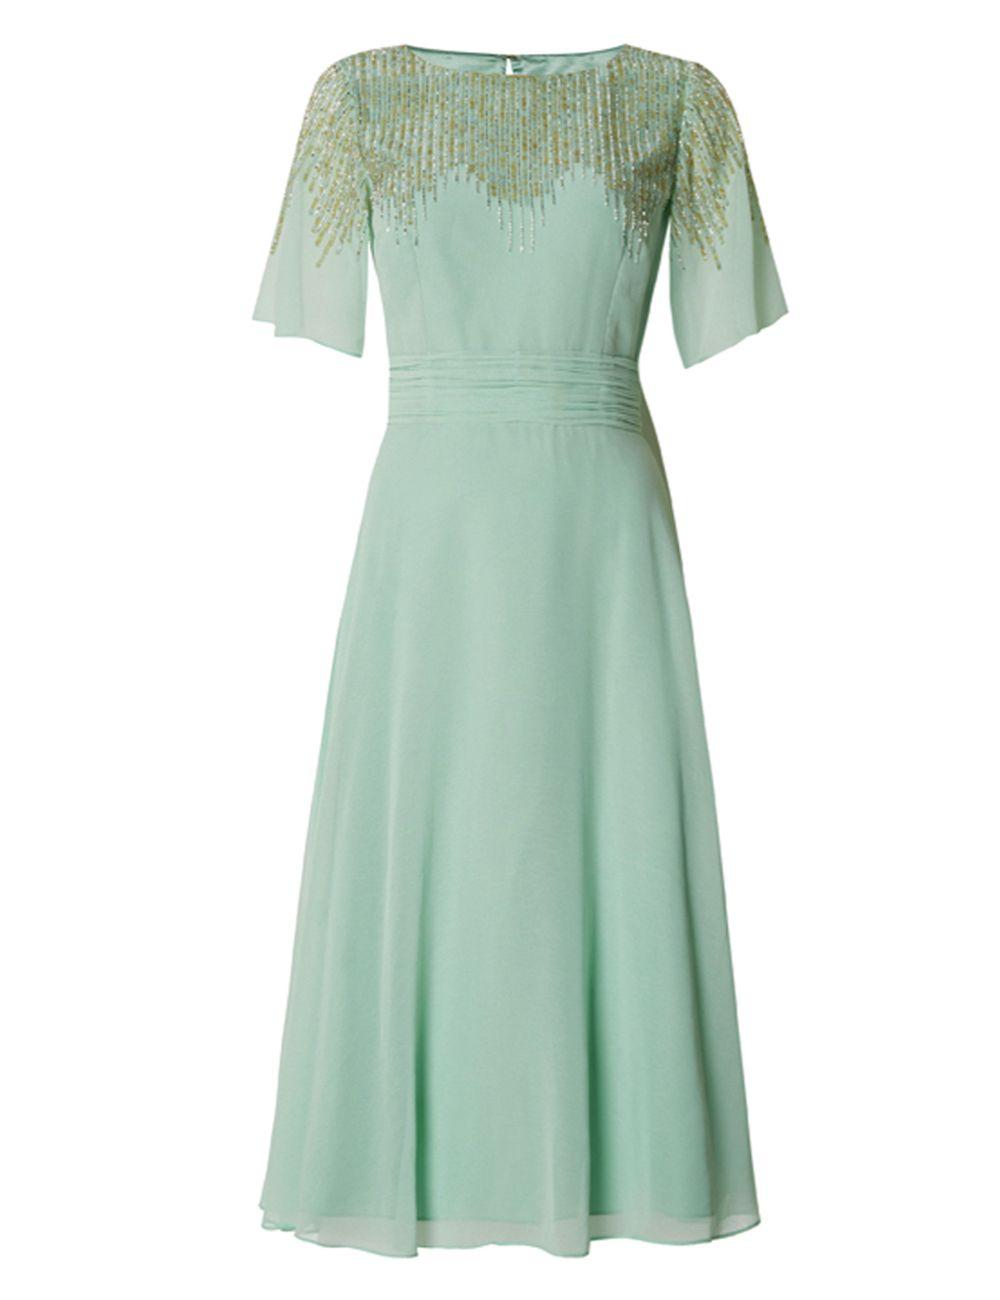 Fabulous High Street Bridesmaid Dresses | High street bridesmaid ...